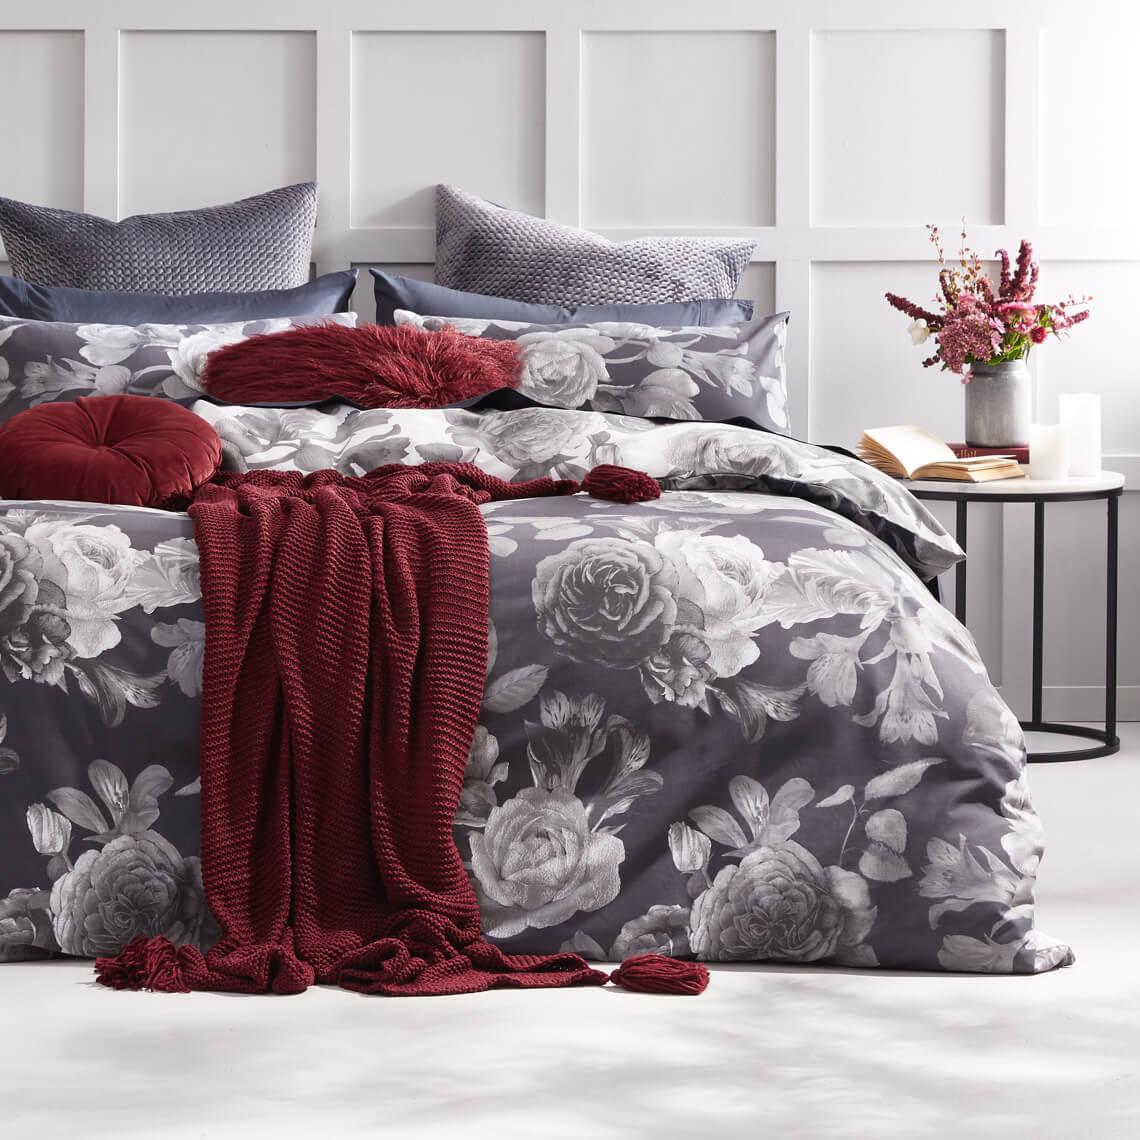 Kmart toys furniture bedding more online shopping australia winter ready reheart Choice Image